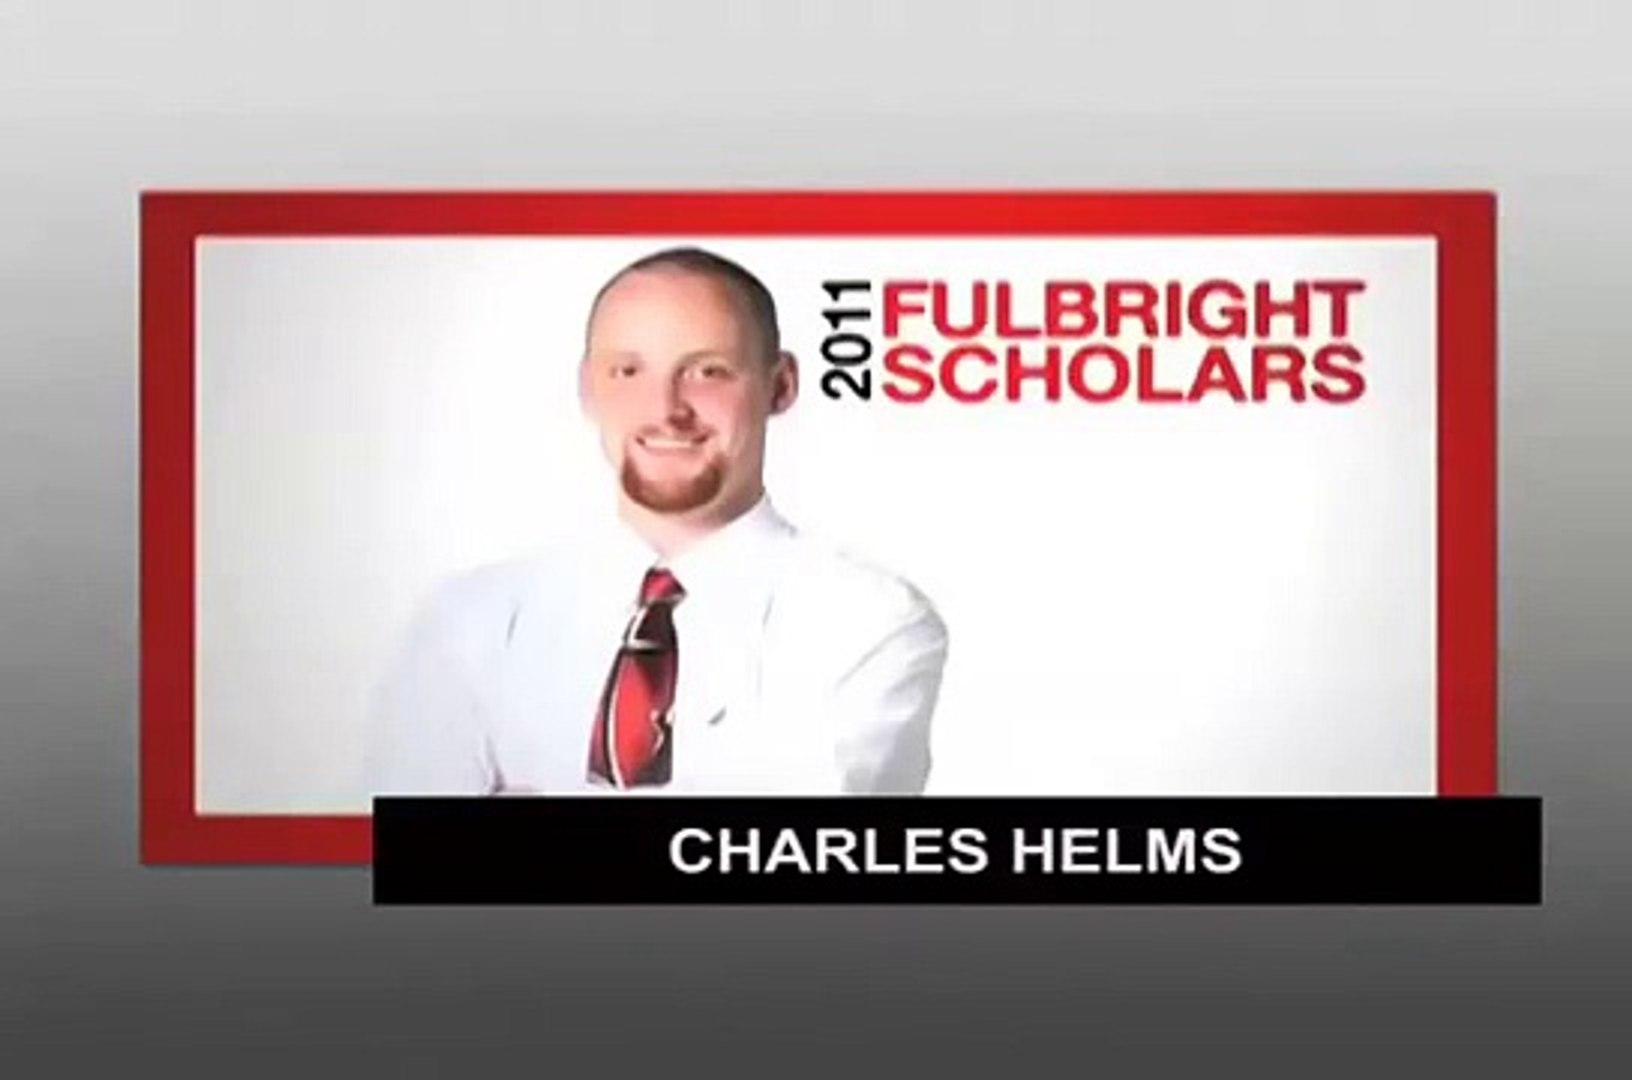 Charles Helms, 2011 US Student Fulbright Scholar